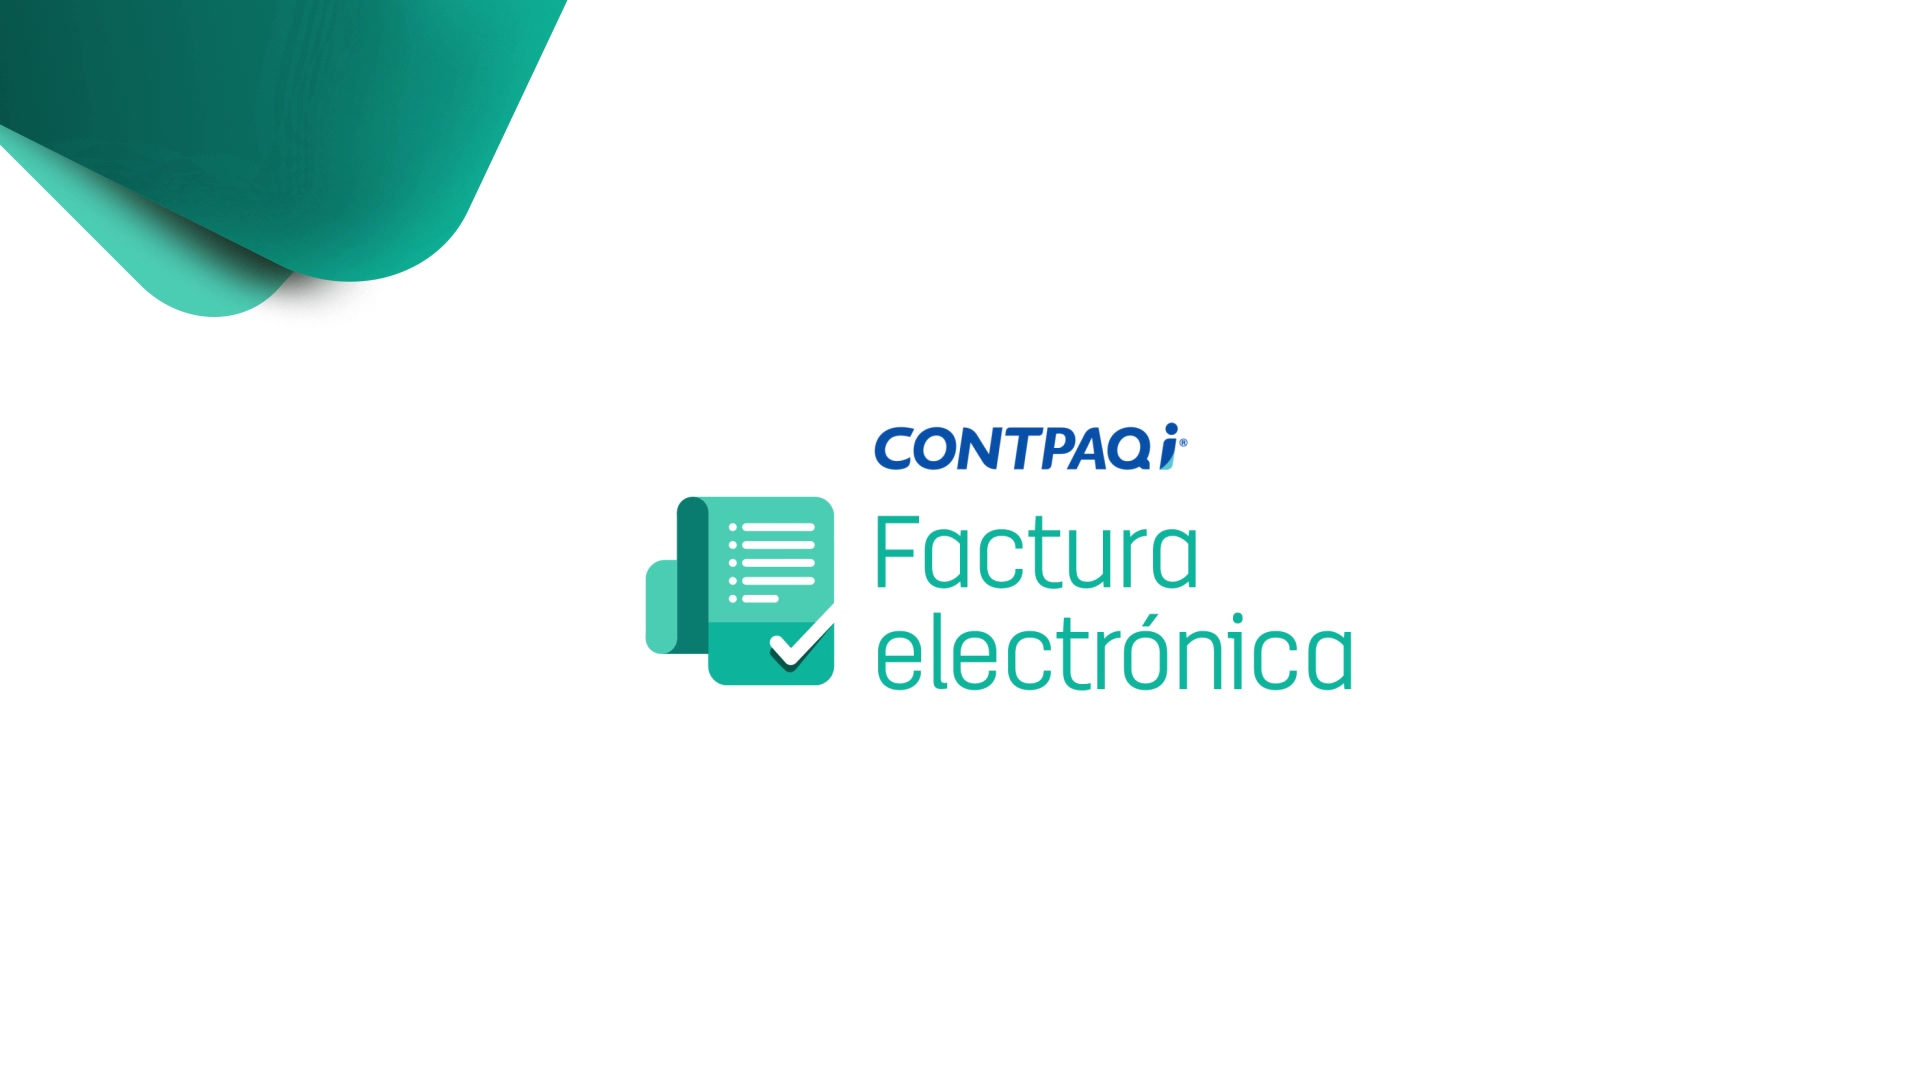 Contpaqi_Factura-Electronica_comercial